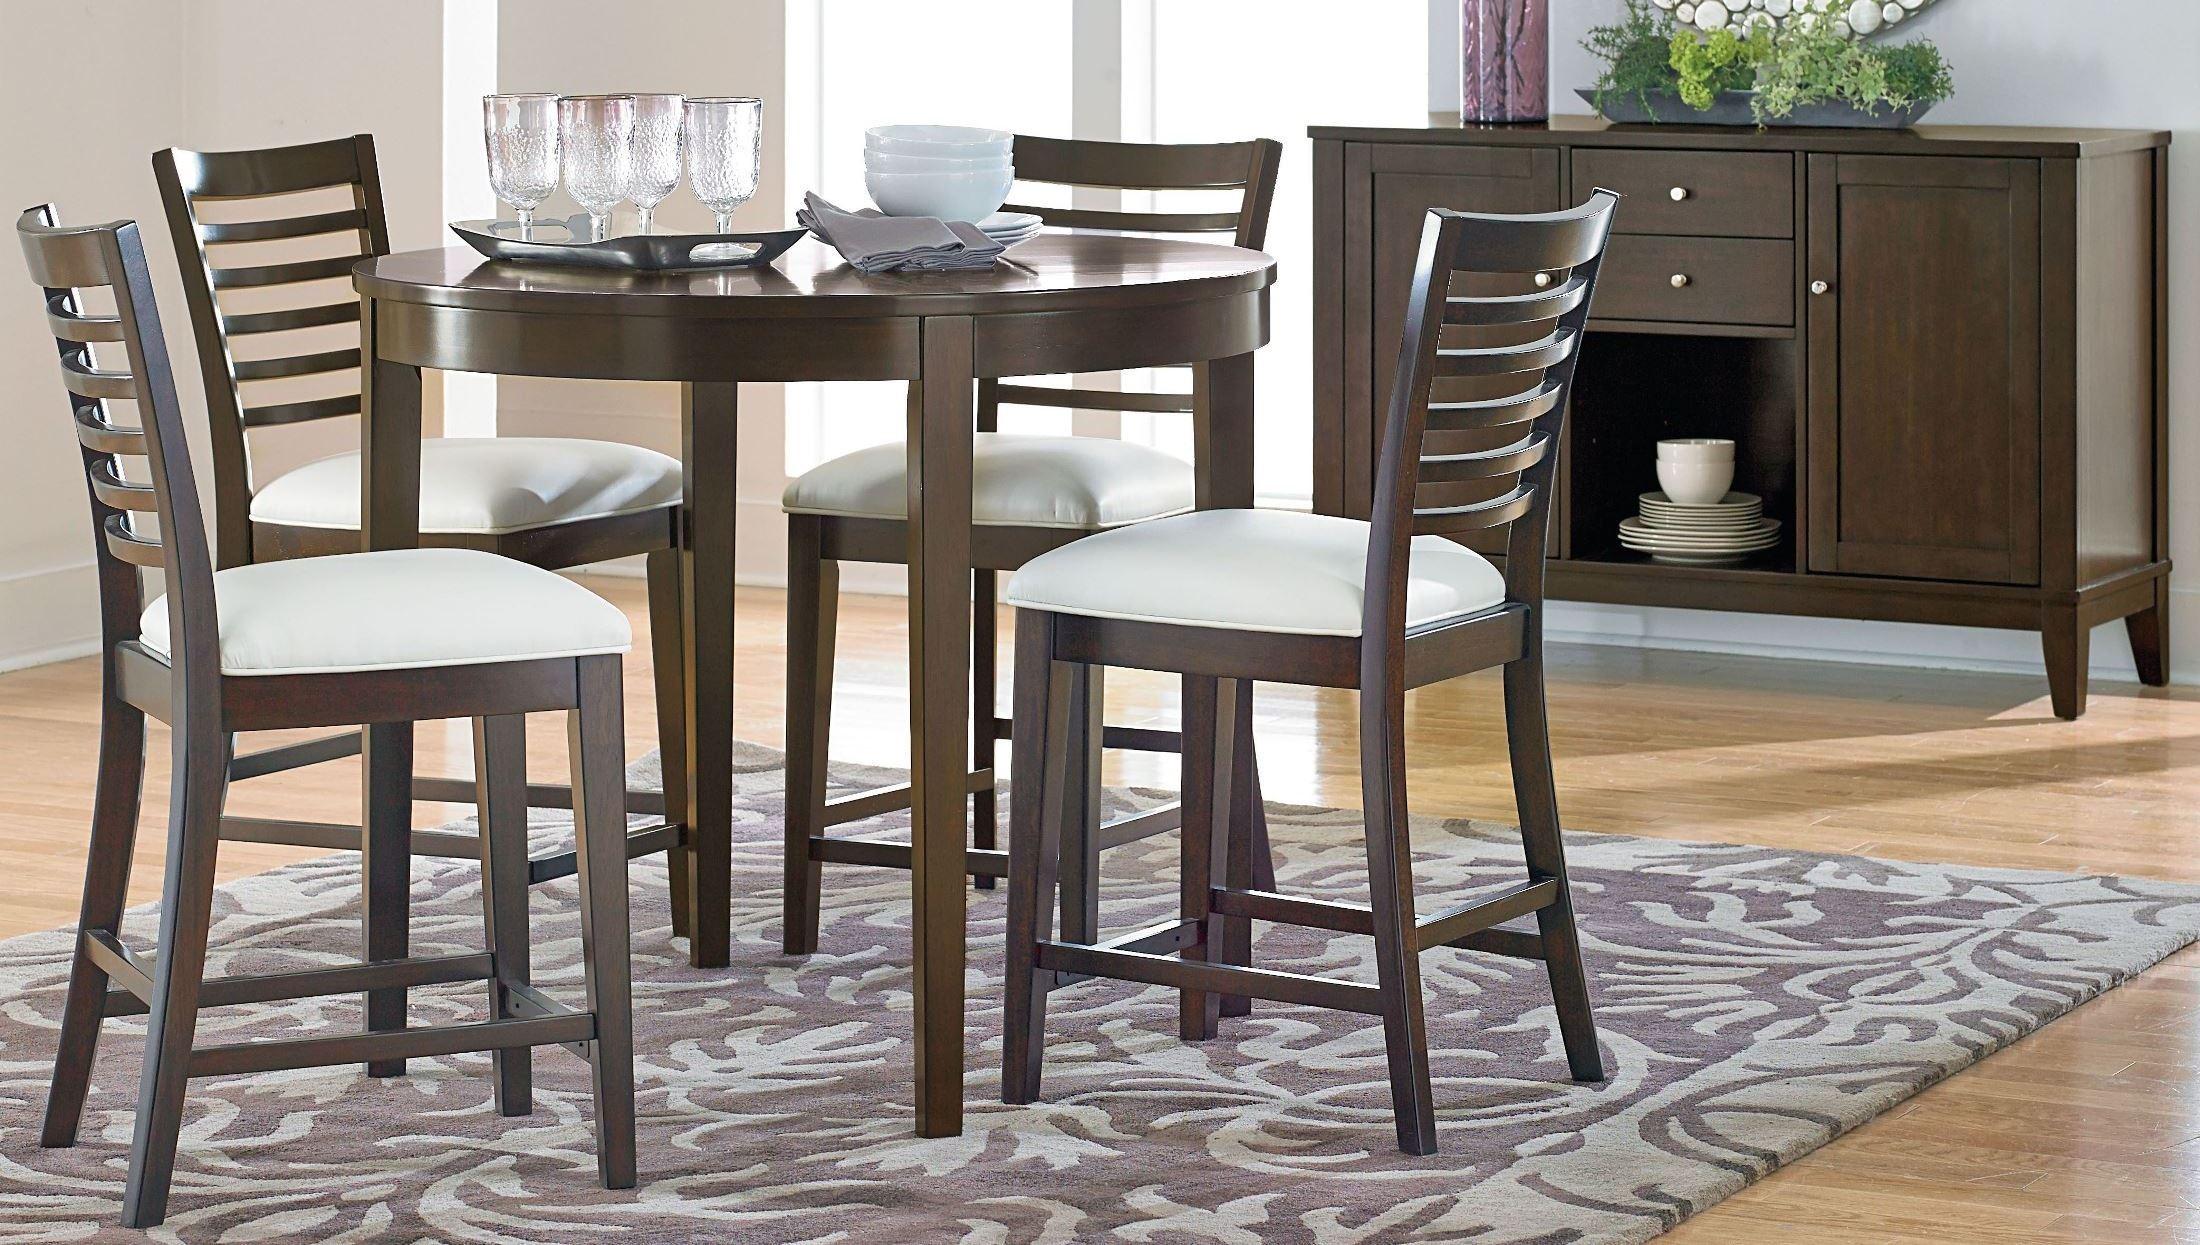 Noveau Dark Merlot Counter Height Round Dining Room Set, 17576, Standard Furniture